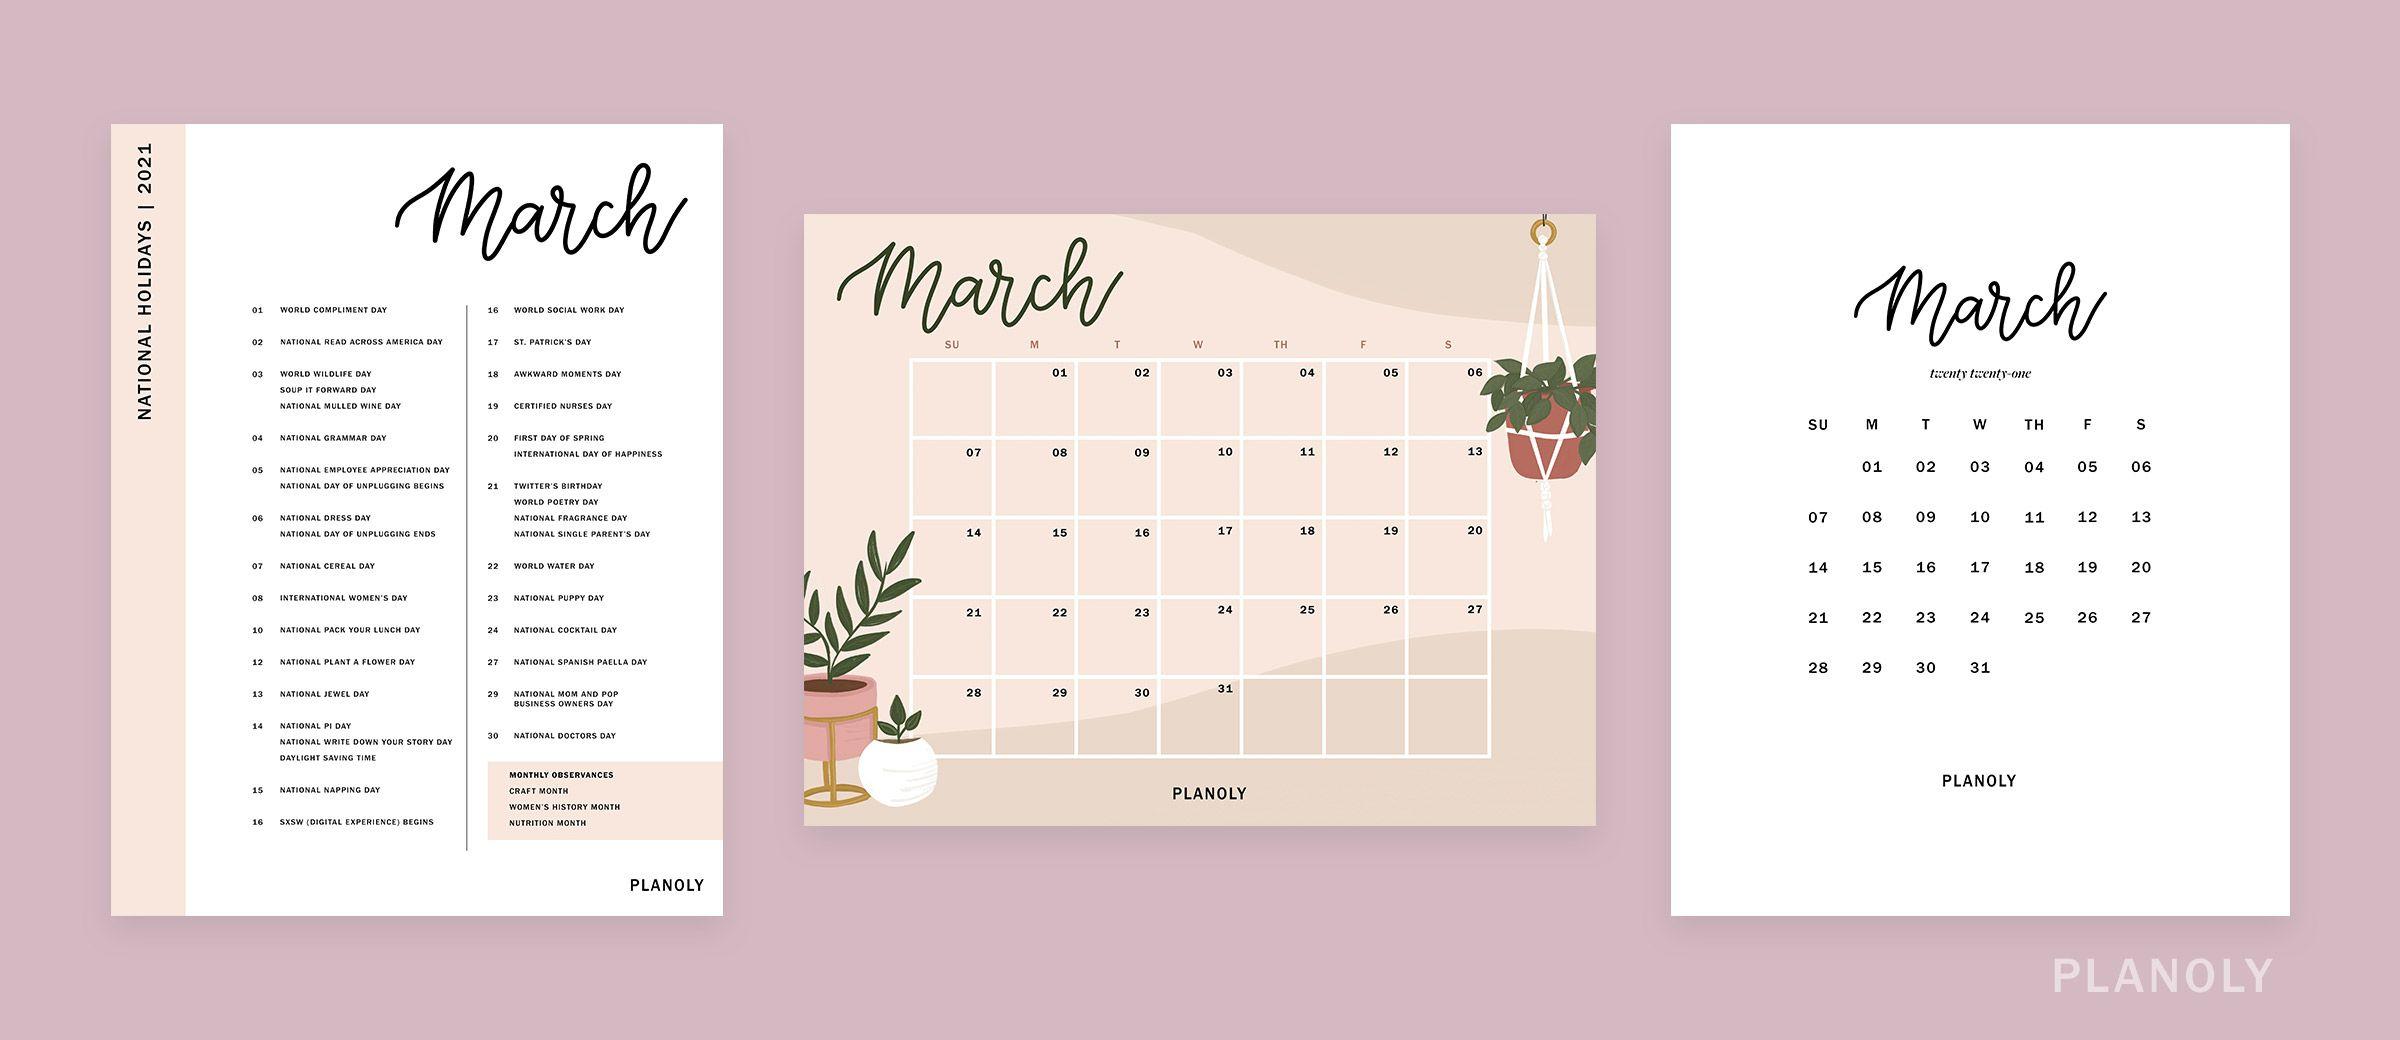 PLANOLY-Blog Post-Q1 Content Calendars-Image 3